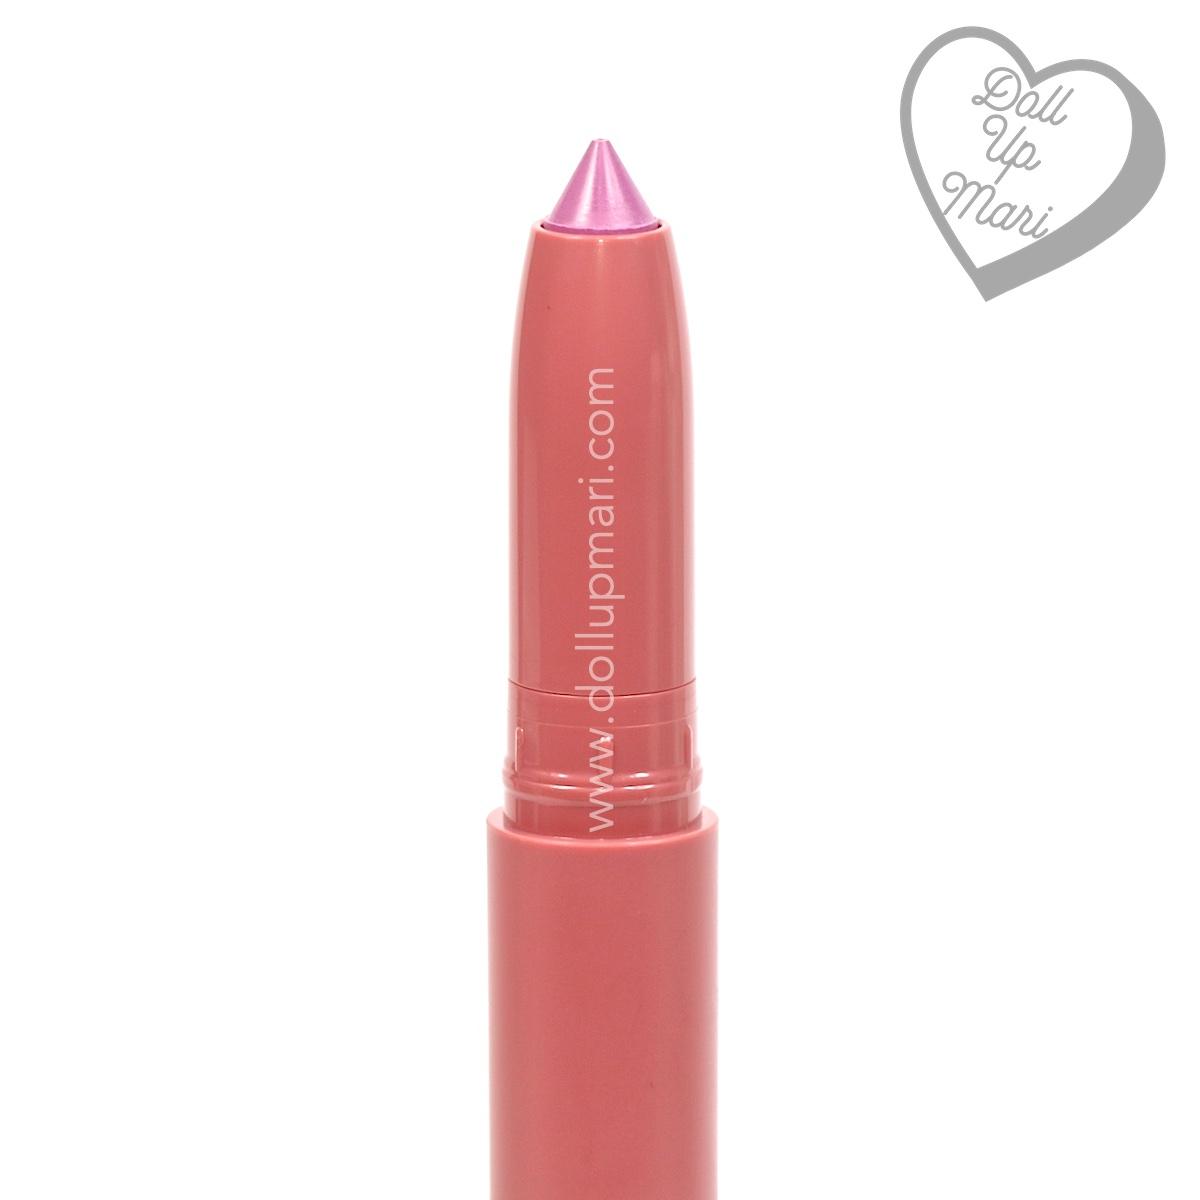 90 Keep It Fun shade of Maybelline Superstay Ink Crayon 8HR Longwear Matte Lipstick